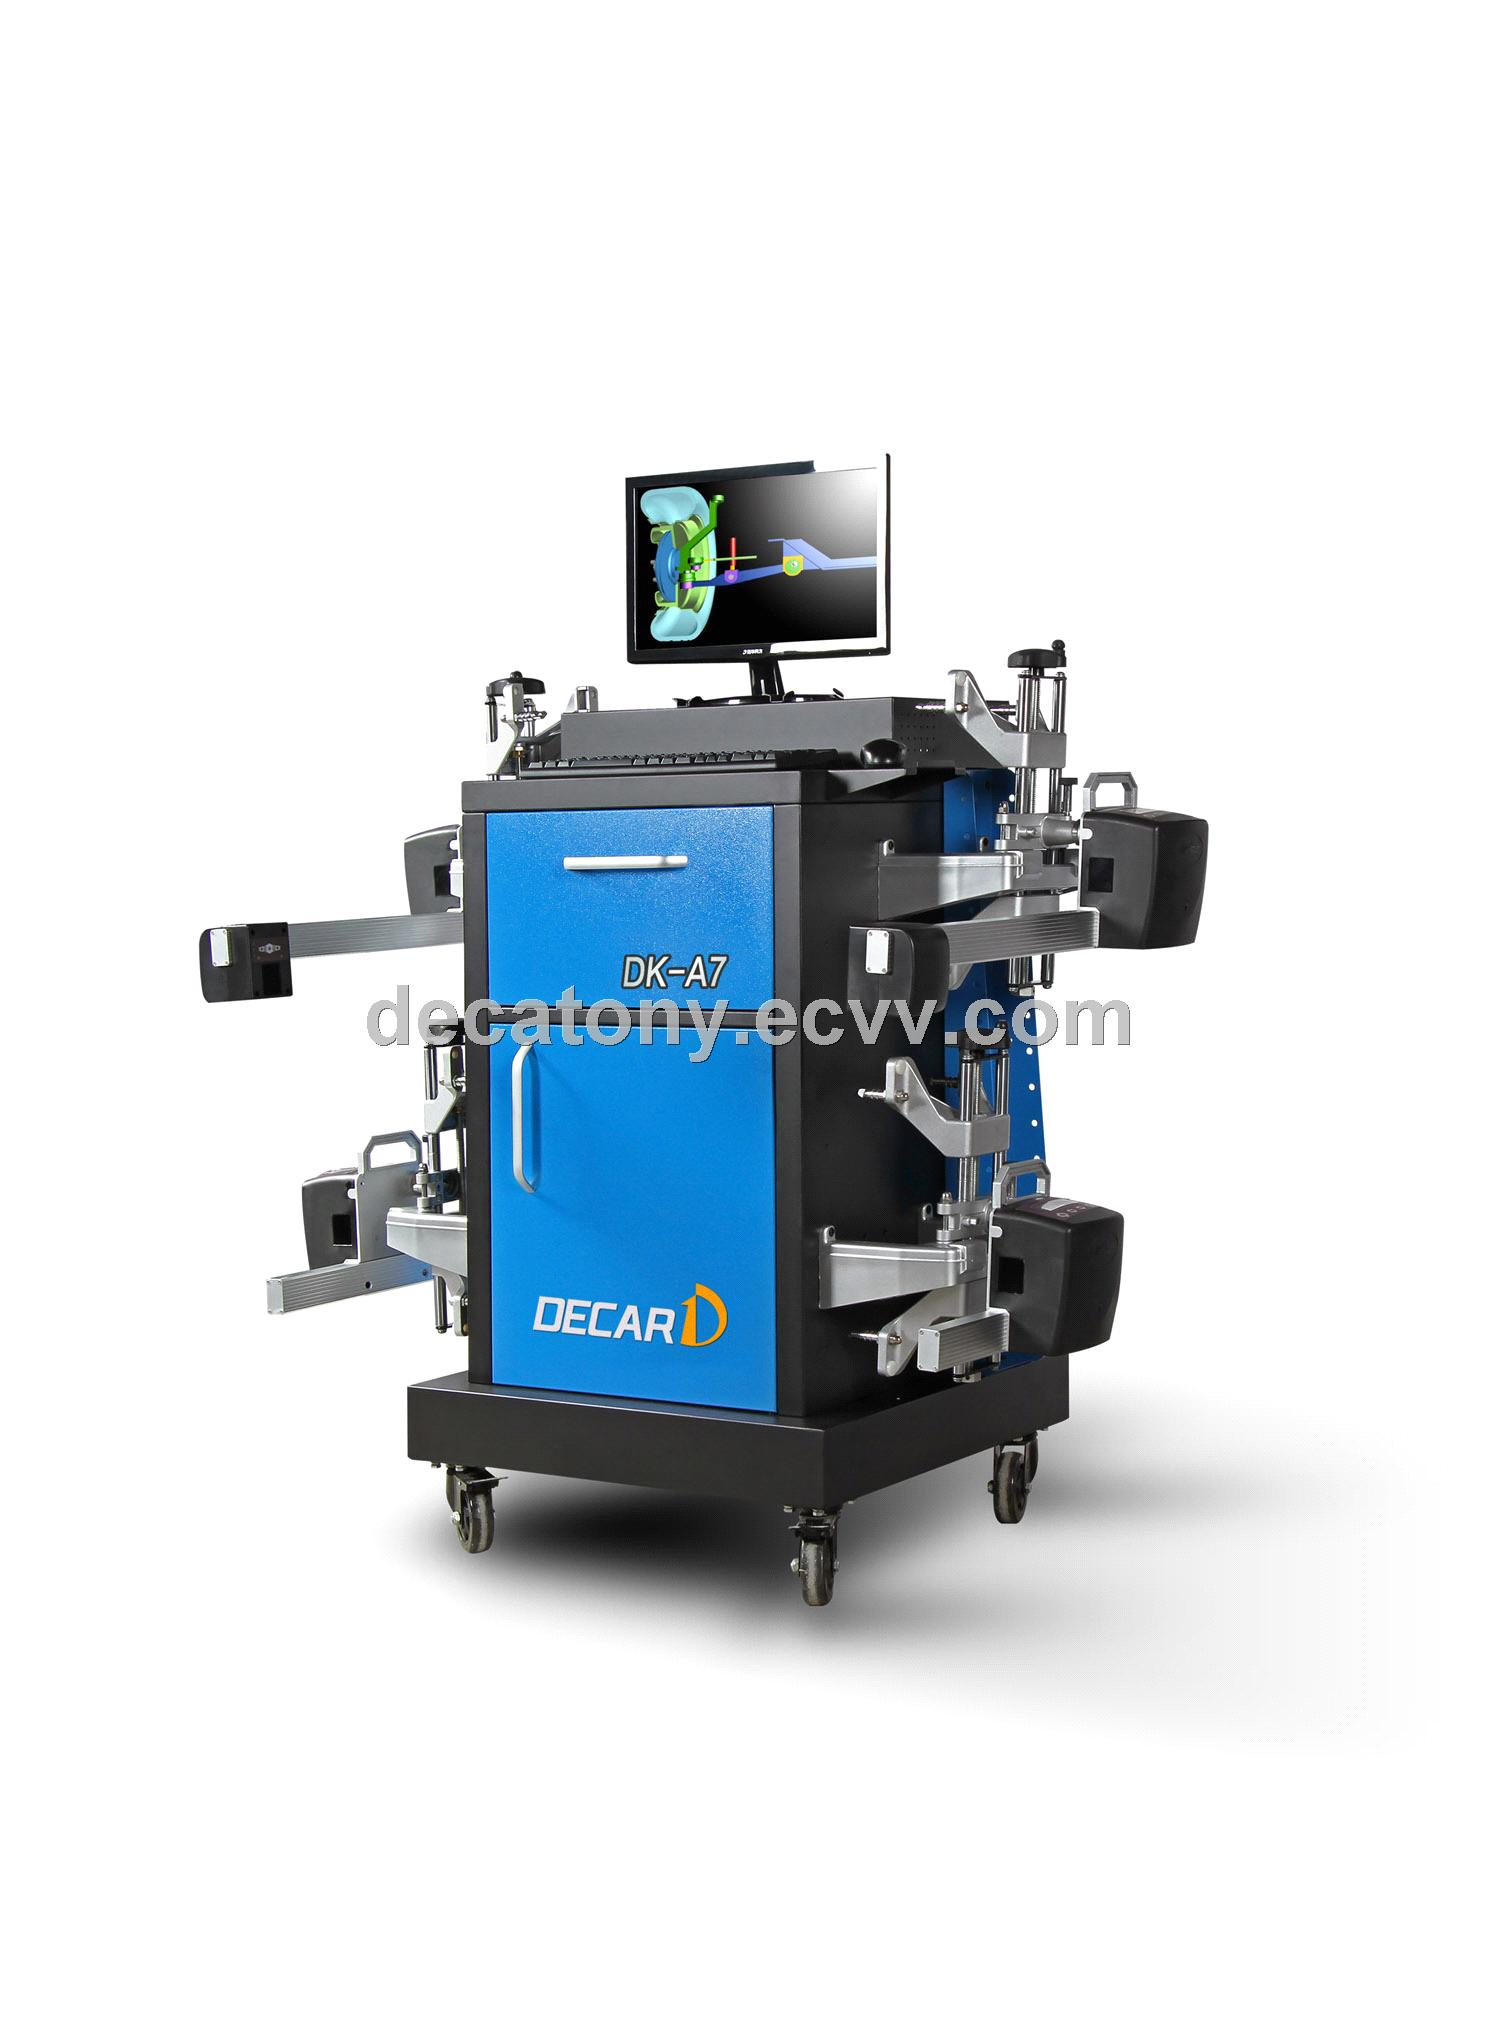 Wheel Alignment Machine >> Ccd Wheel Alignment Machine For Sale